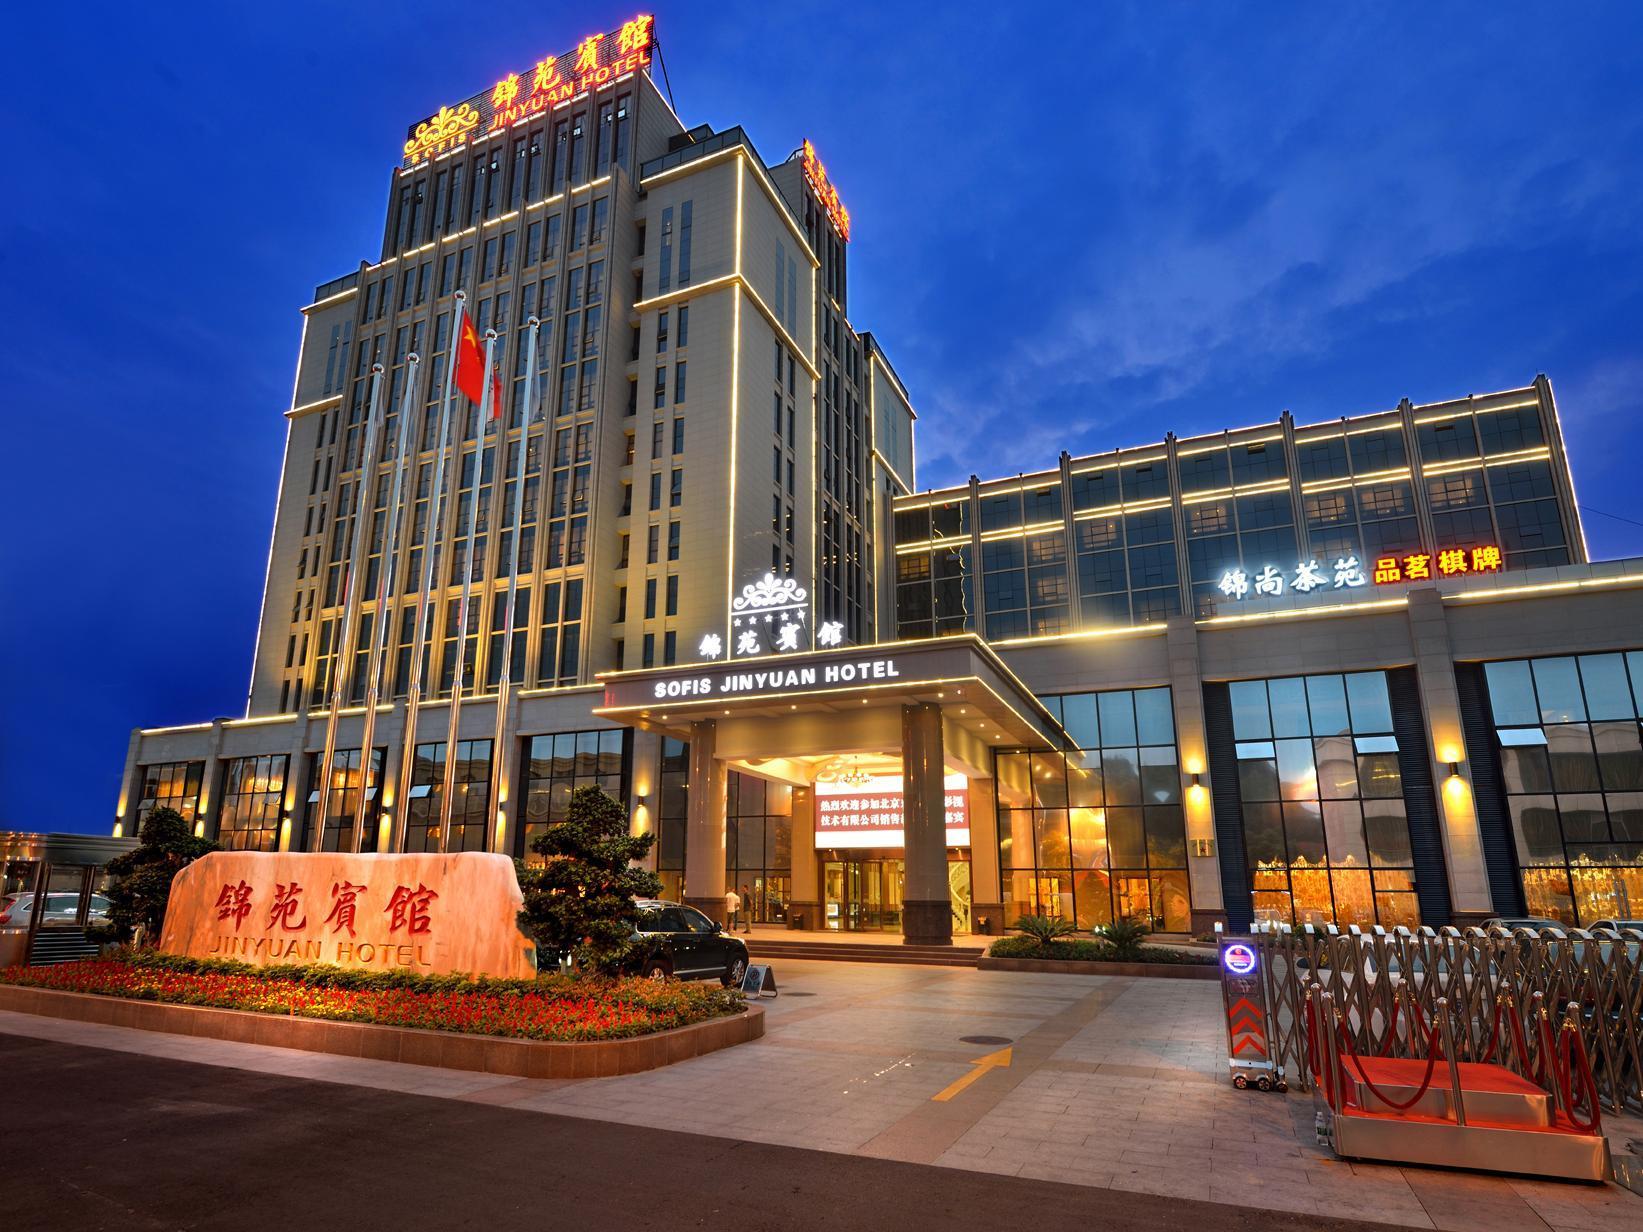 Chengdu Sofis Jinyuan Hotel